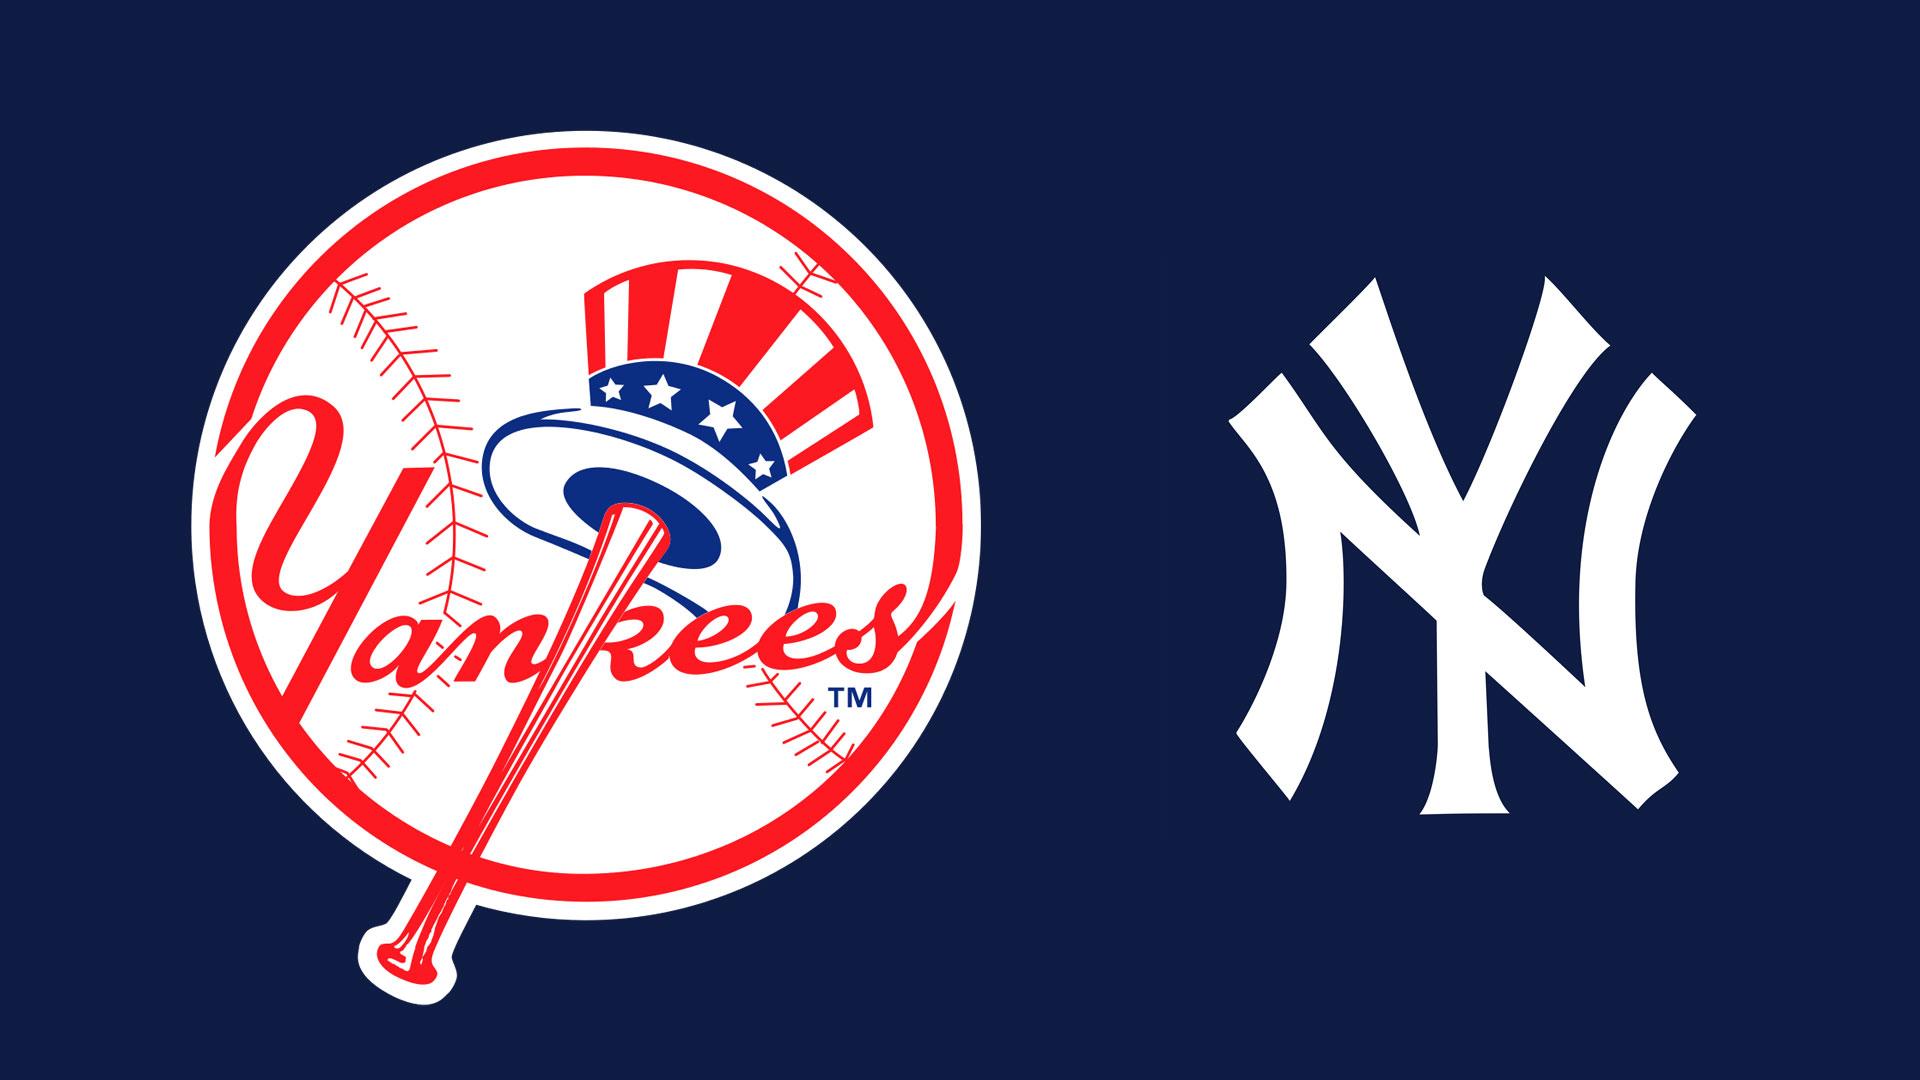 11 HD New York Yankees Wallpapers - HDWallSource.com